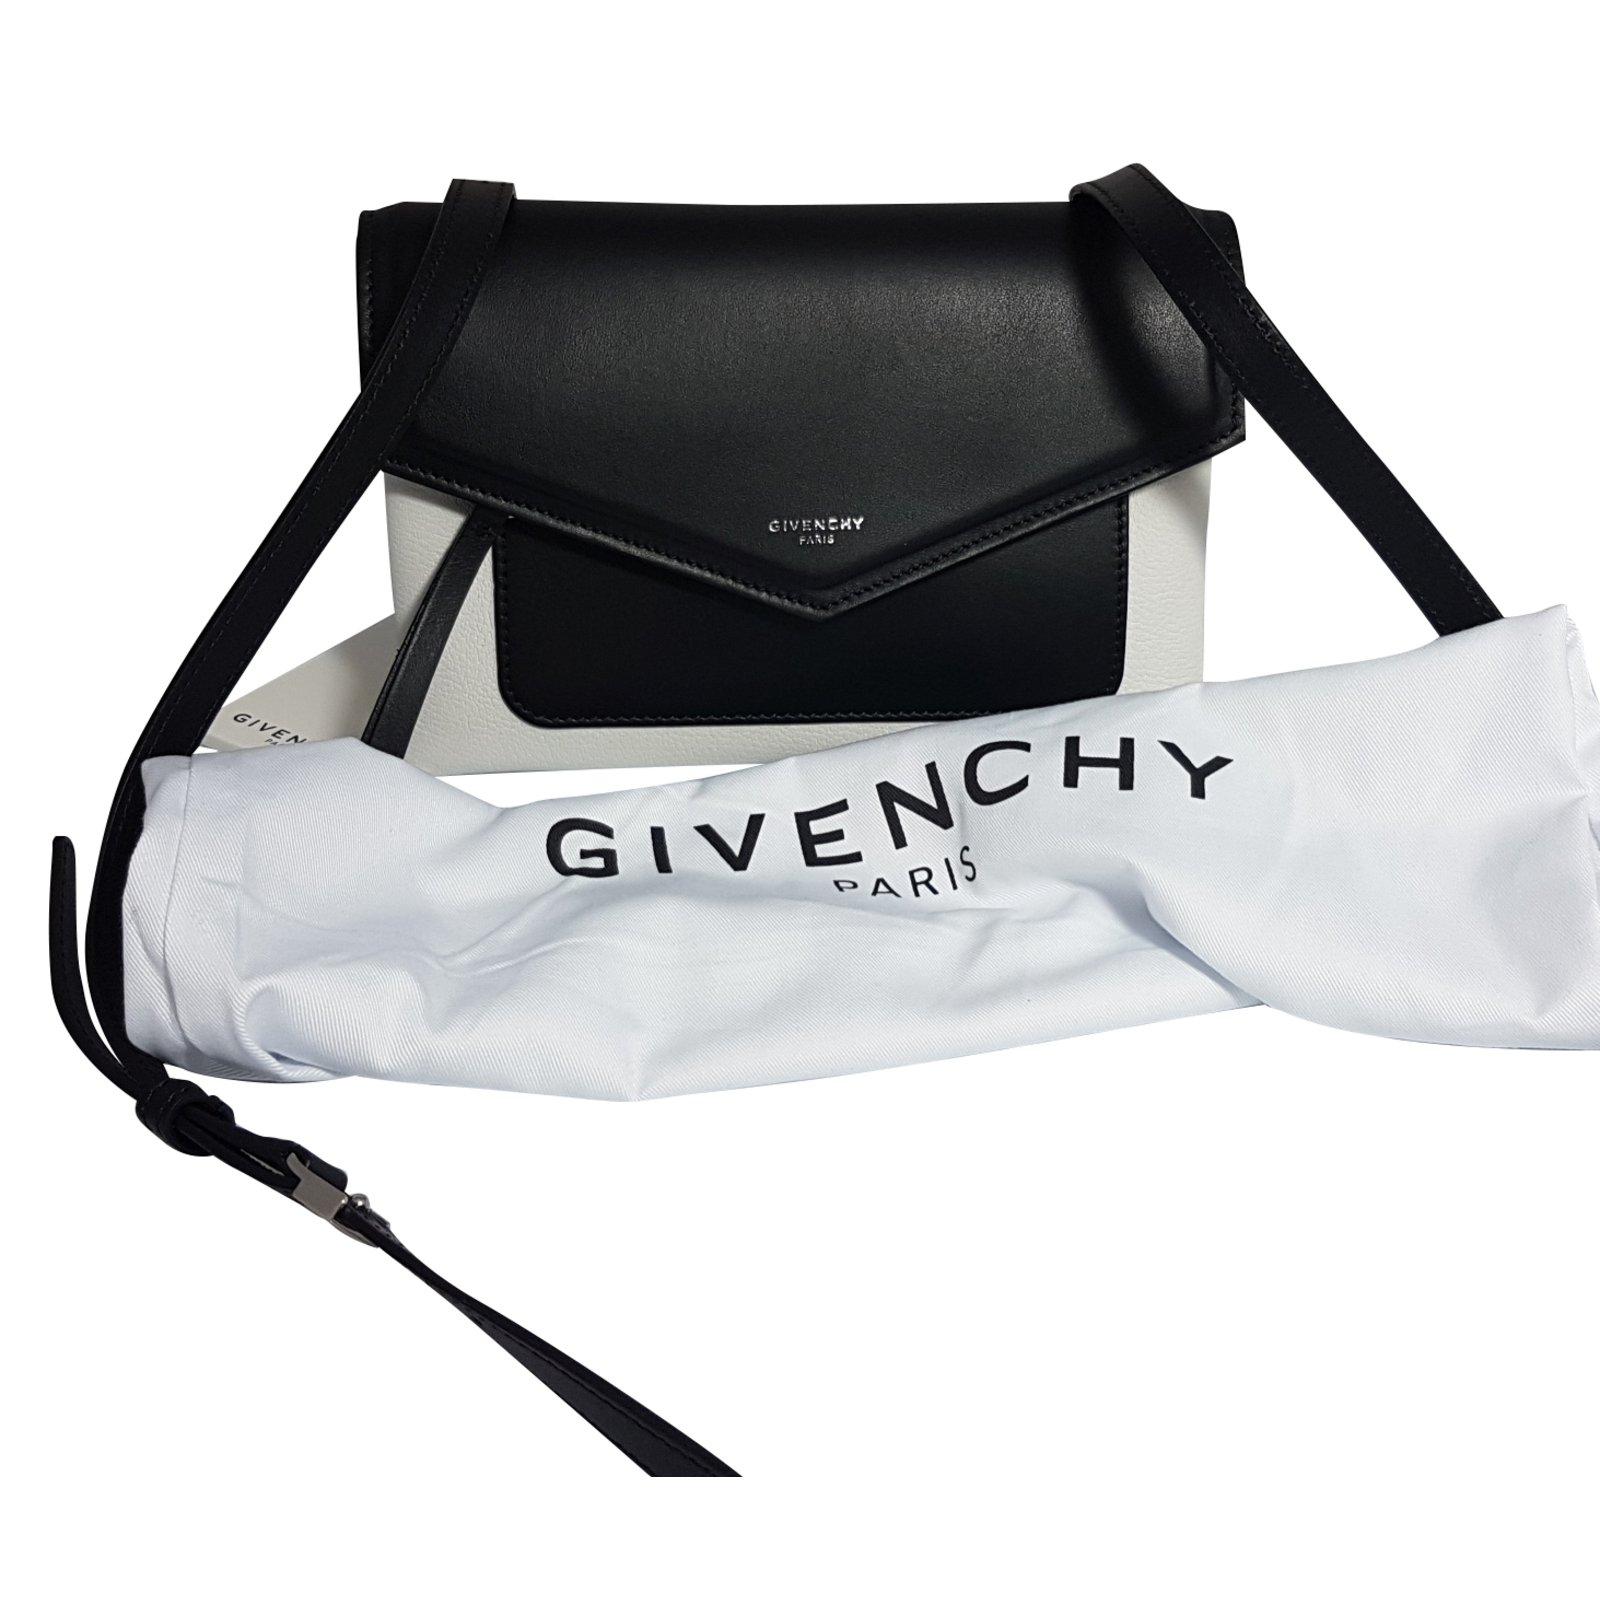 4be3ee62ba Sacs à main Givenchy Givenchy Duetto Crossbody Cuir Multicolore ref.48740 -  Joli Closet